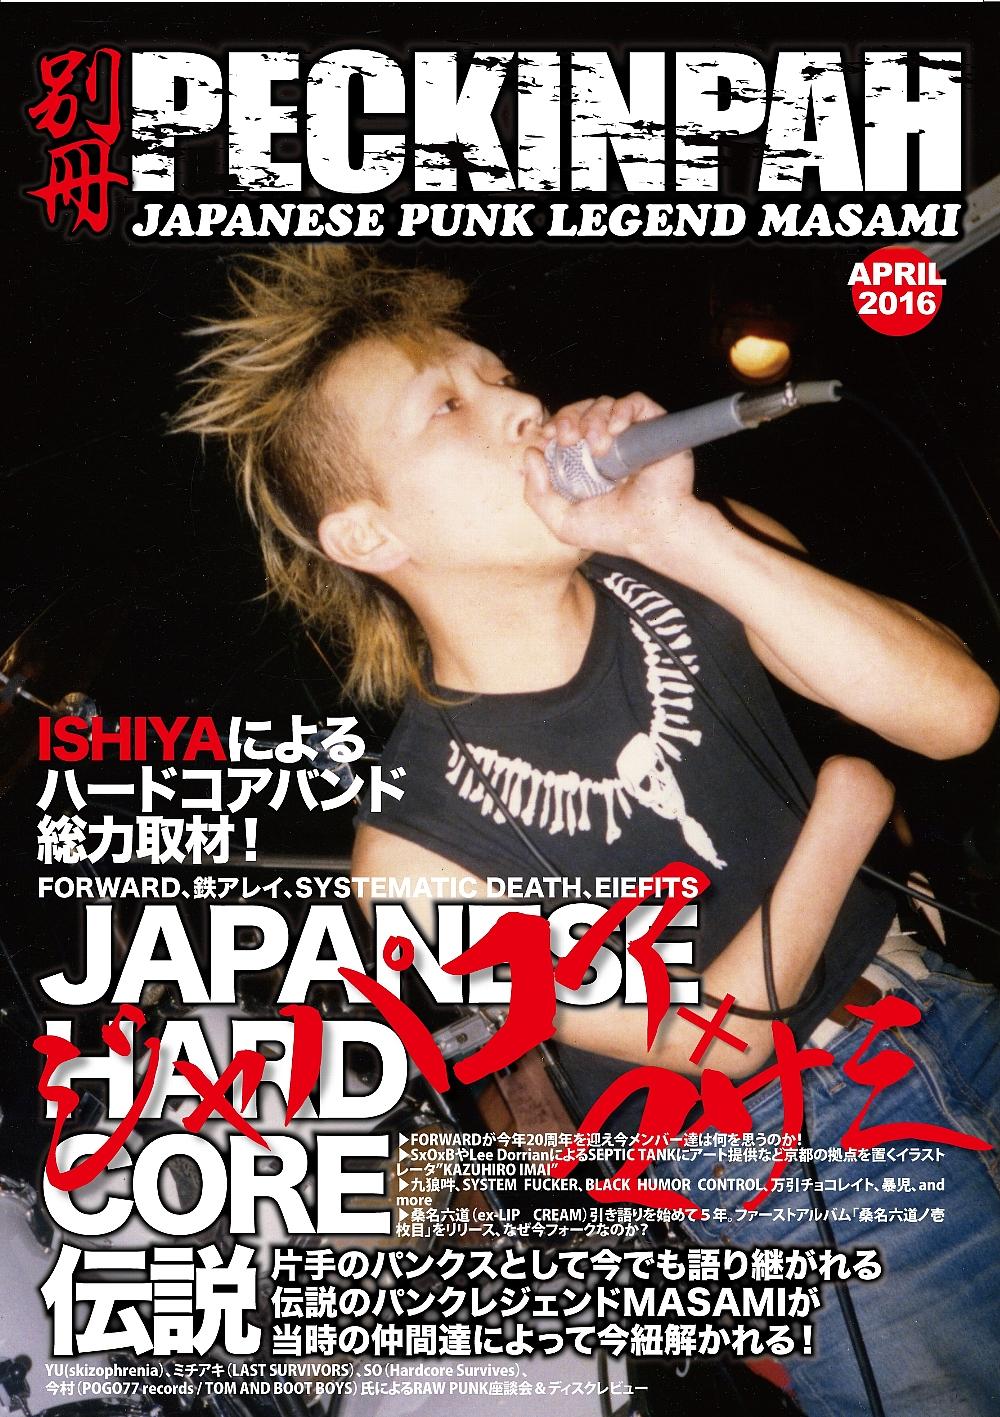 BTB 006 1 - 別冊ペキンパー JAPANESE HARD CORE伝説 片手のパンクスMASAMI